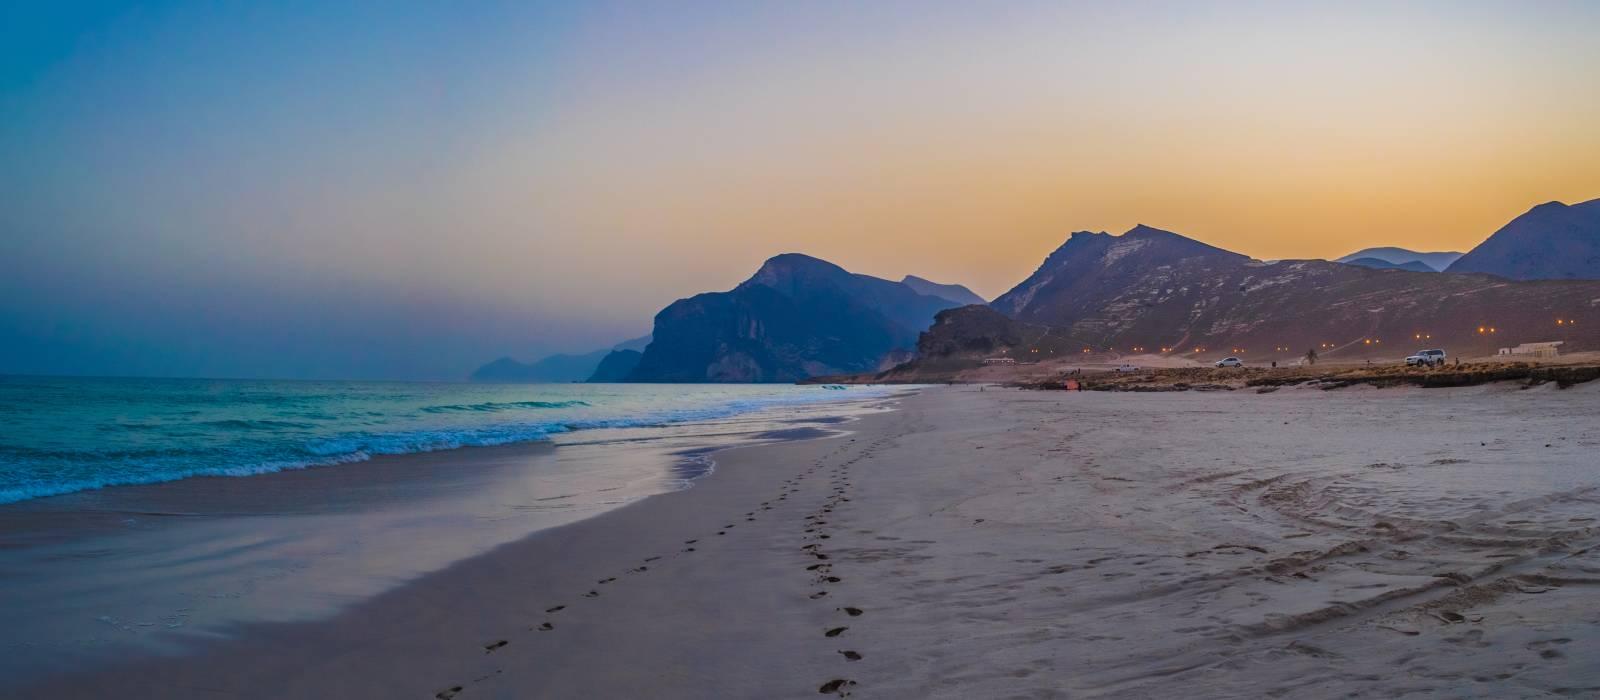 Sonnenuntergang am Mughsayl-Strand in Salalah, Oman